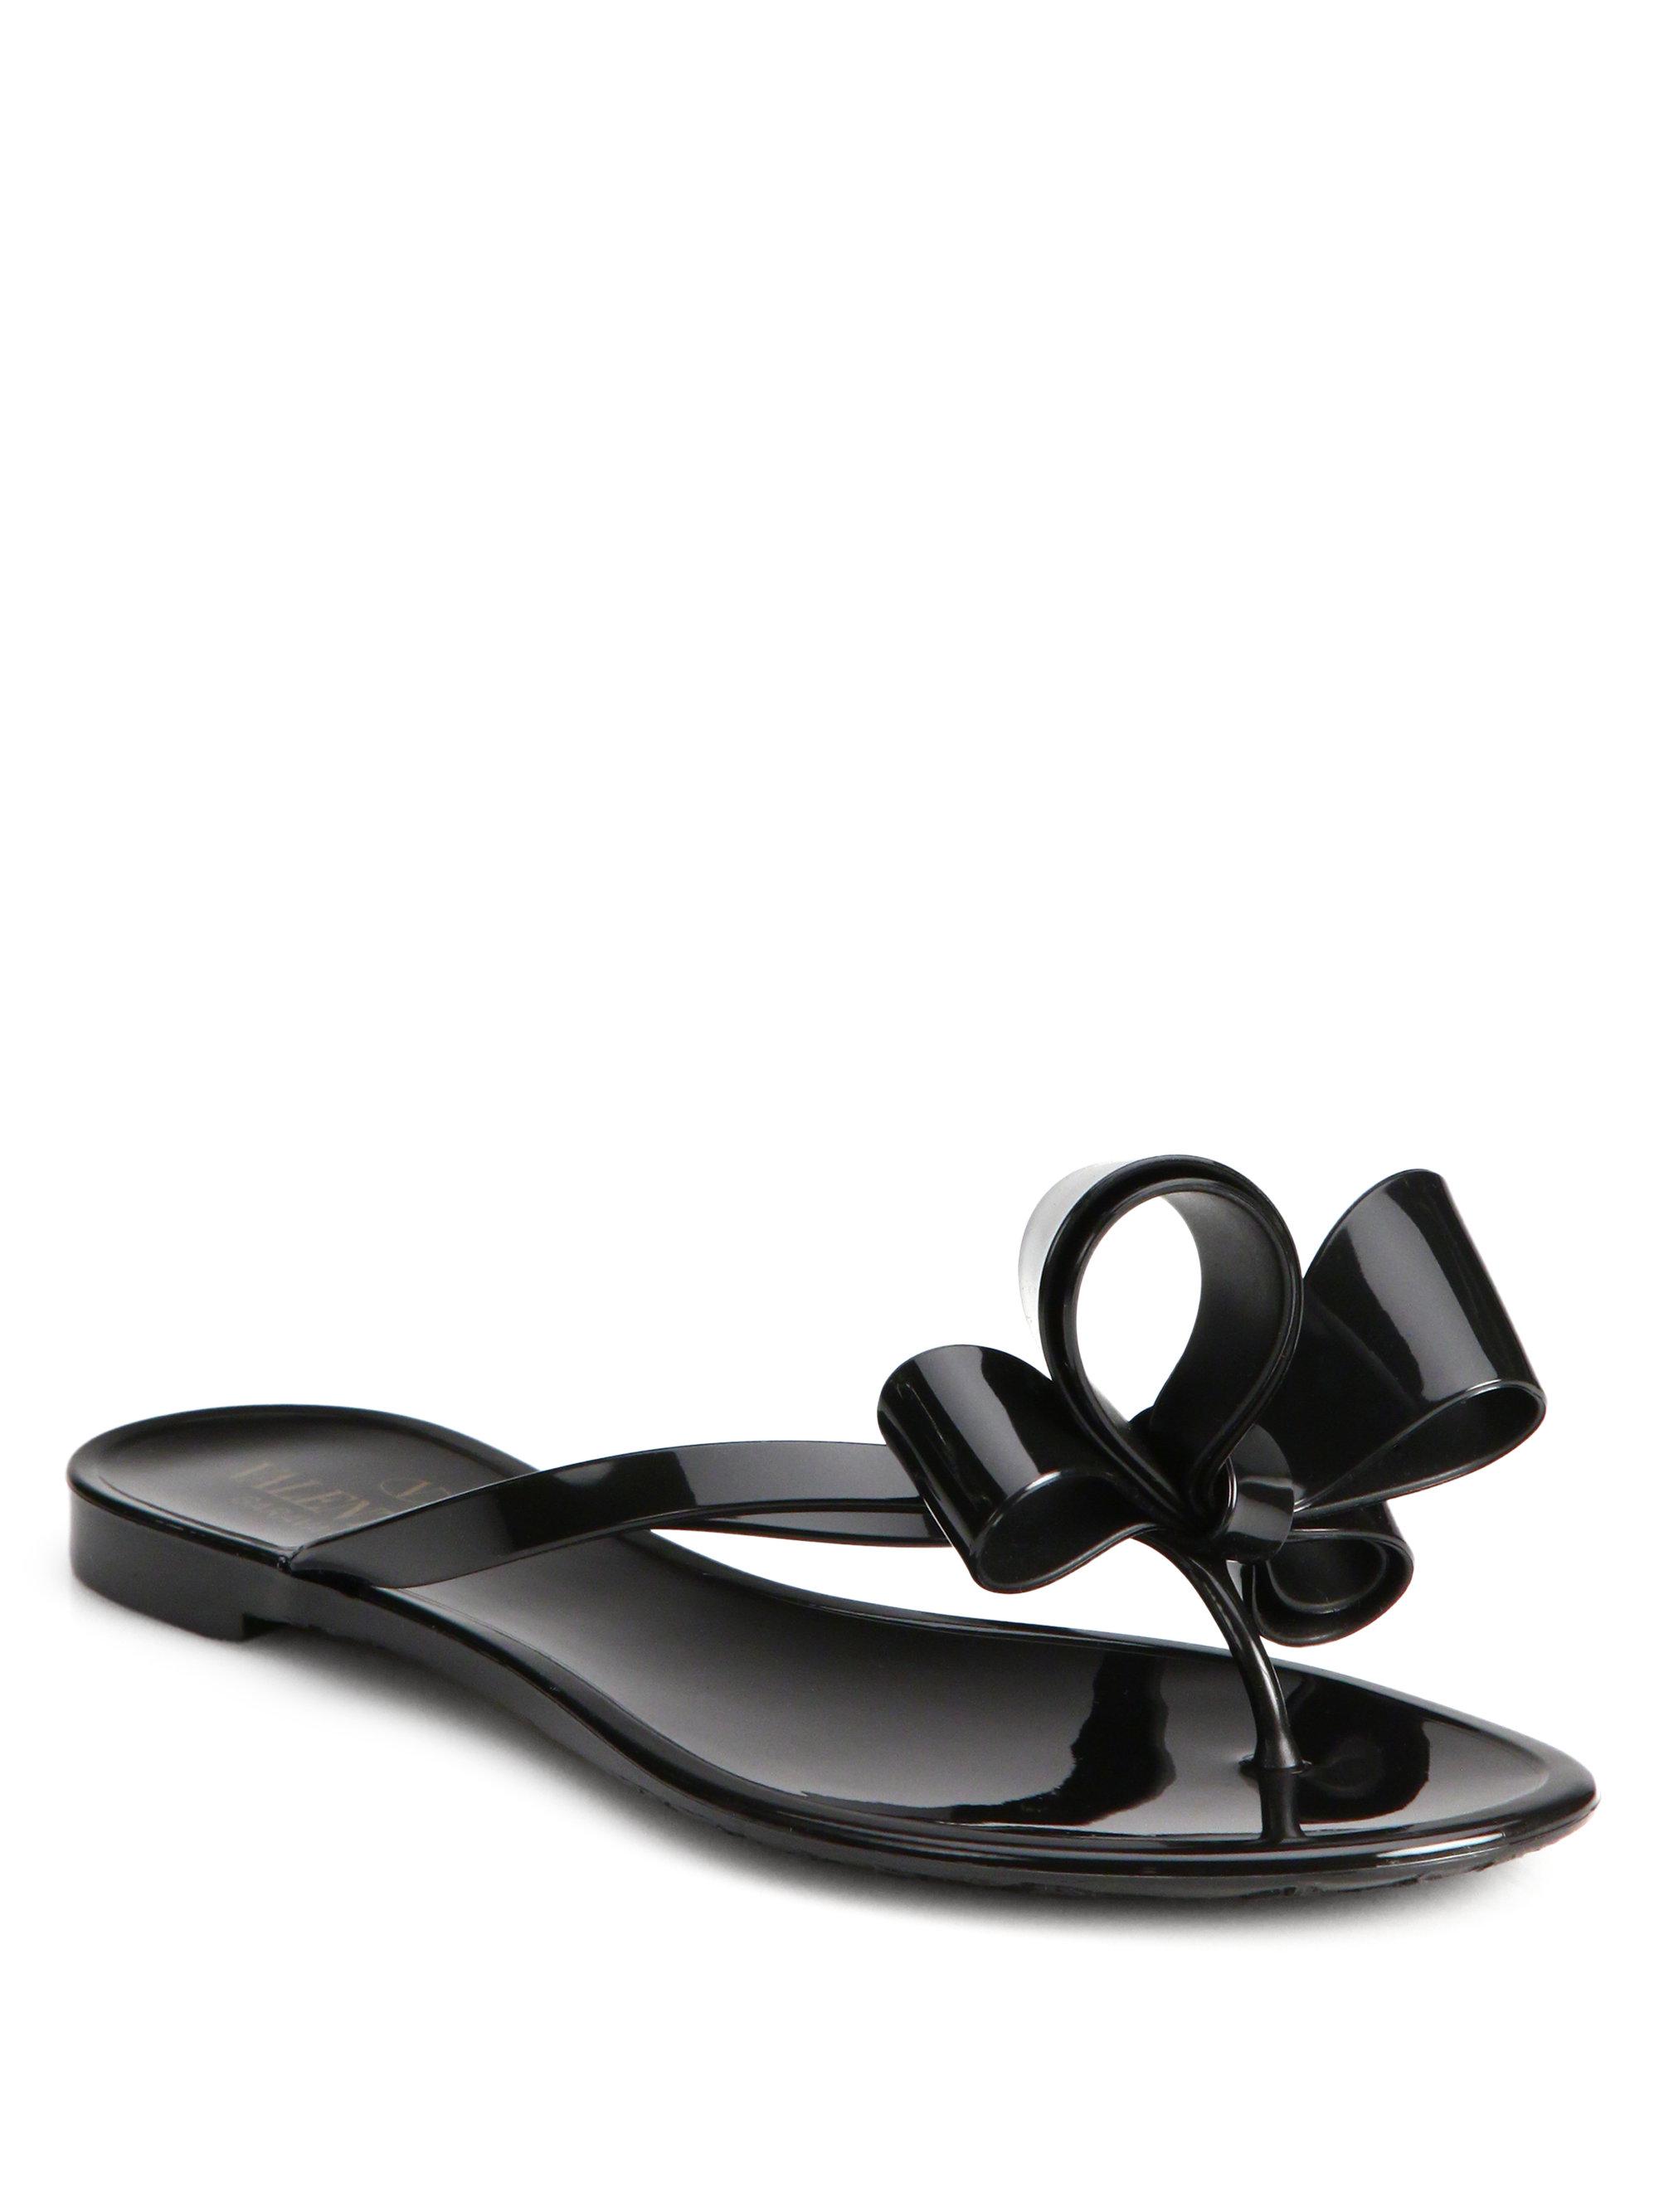 19ba6e22e Lyst - Valentino Couture Bow Jelly Flip Flops in Black